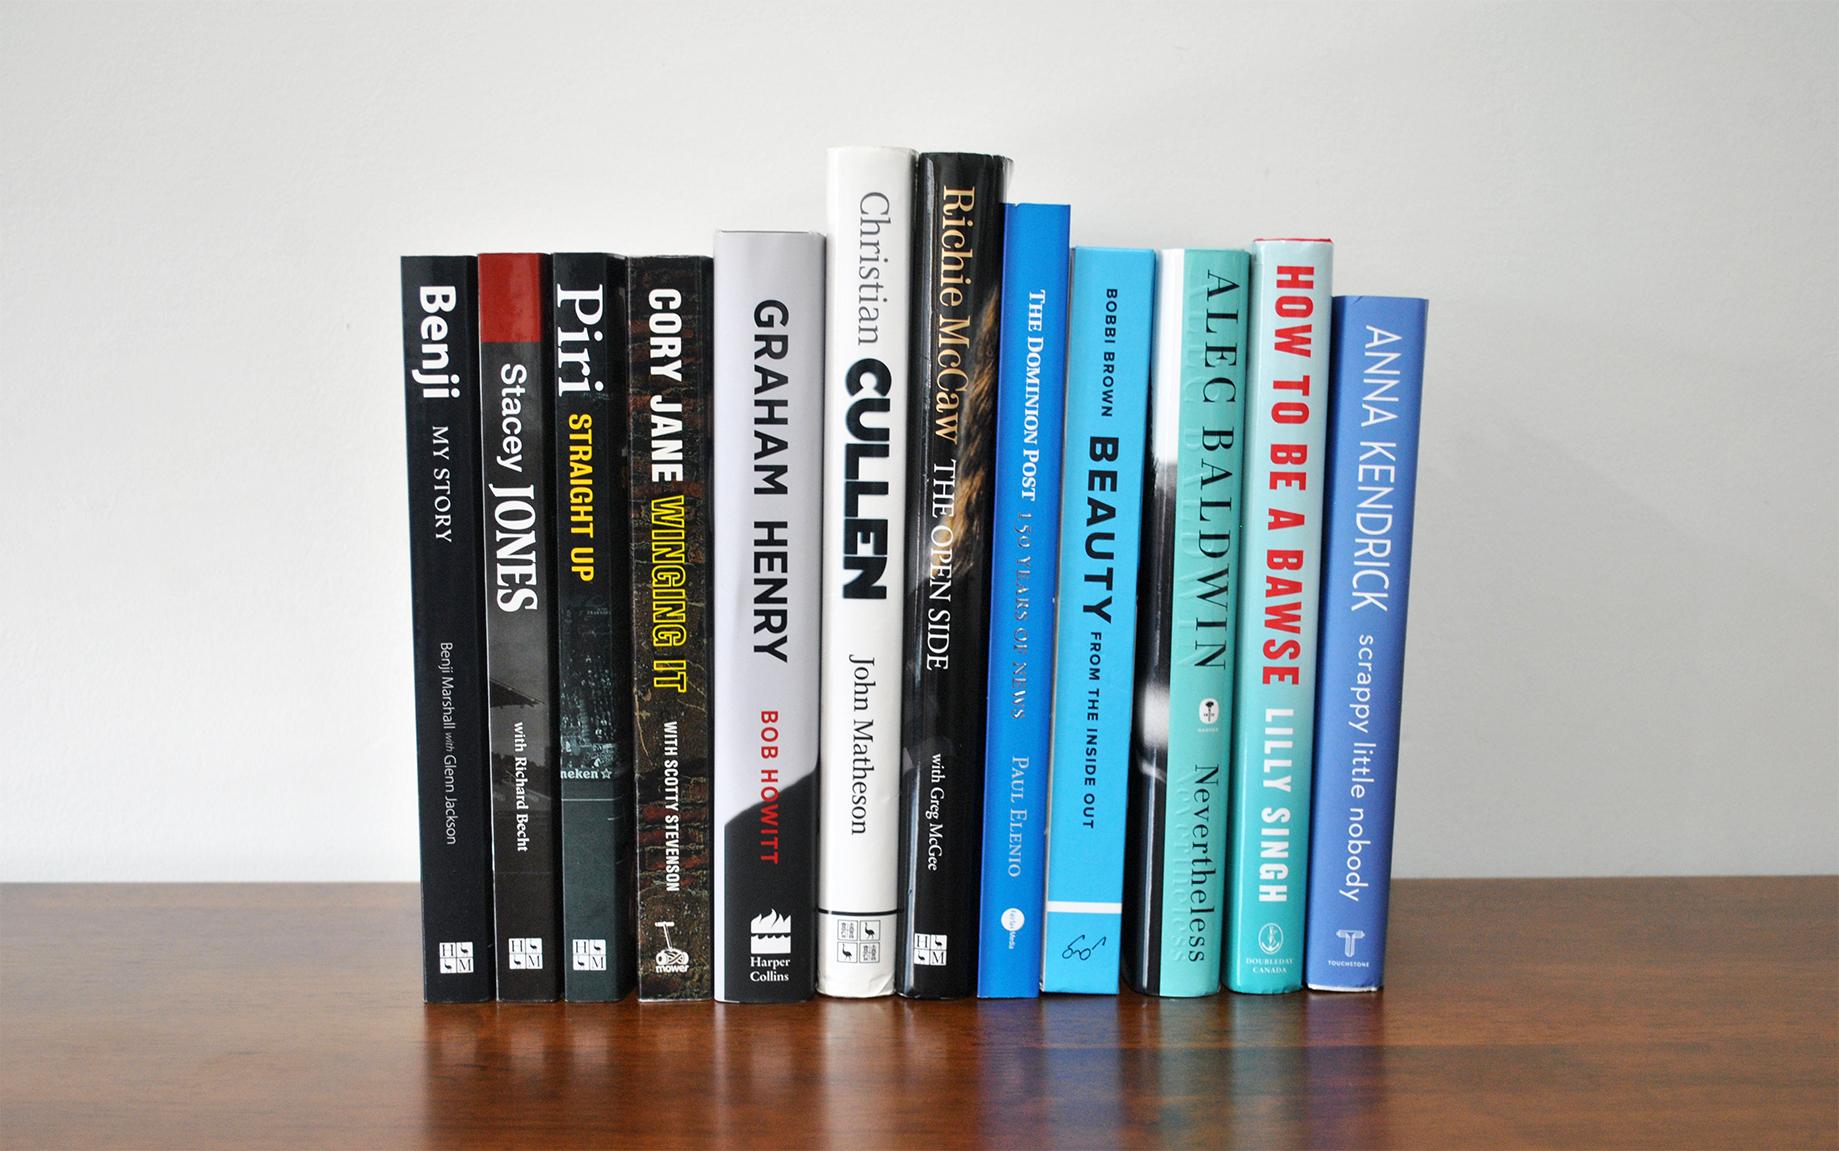 Memorabilia - Autographed Books